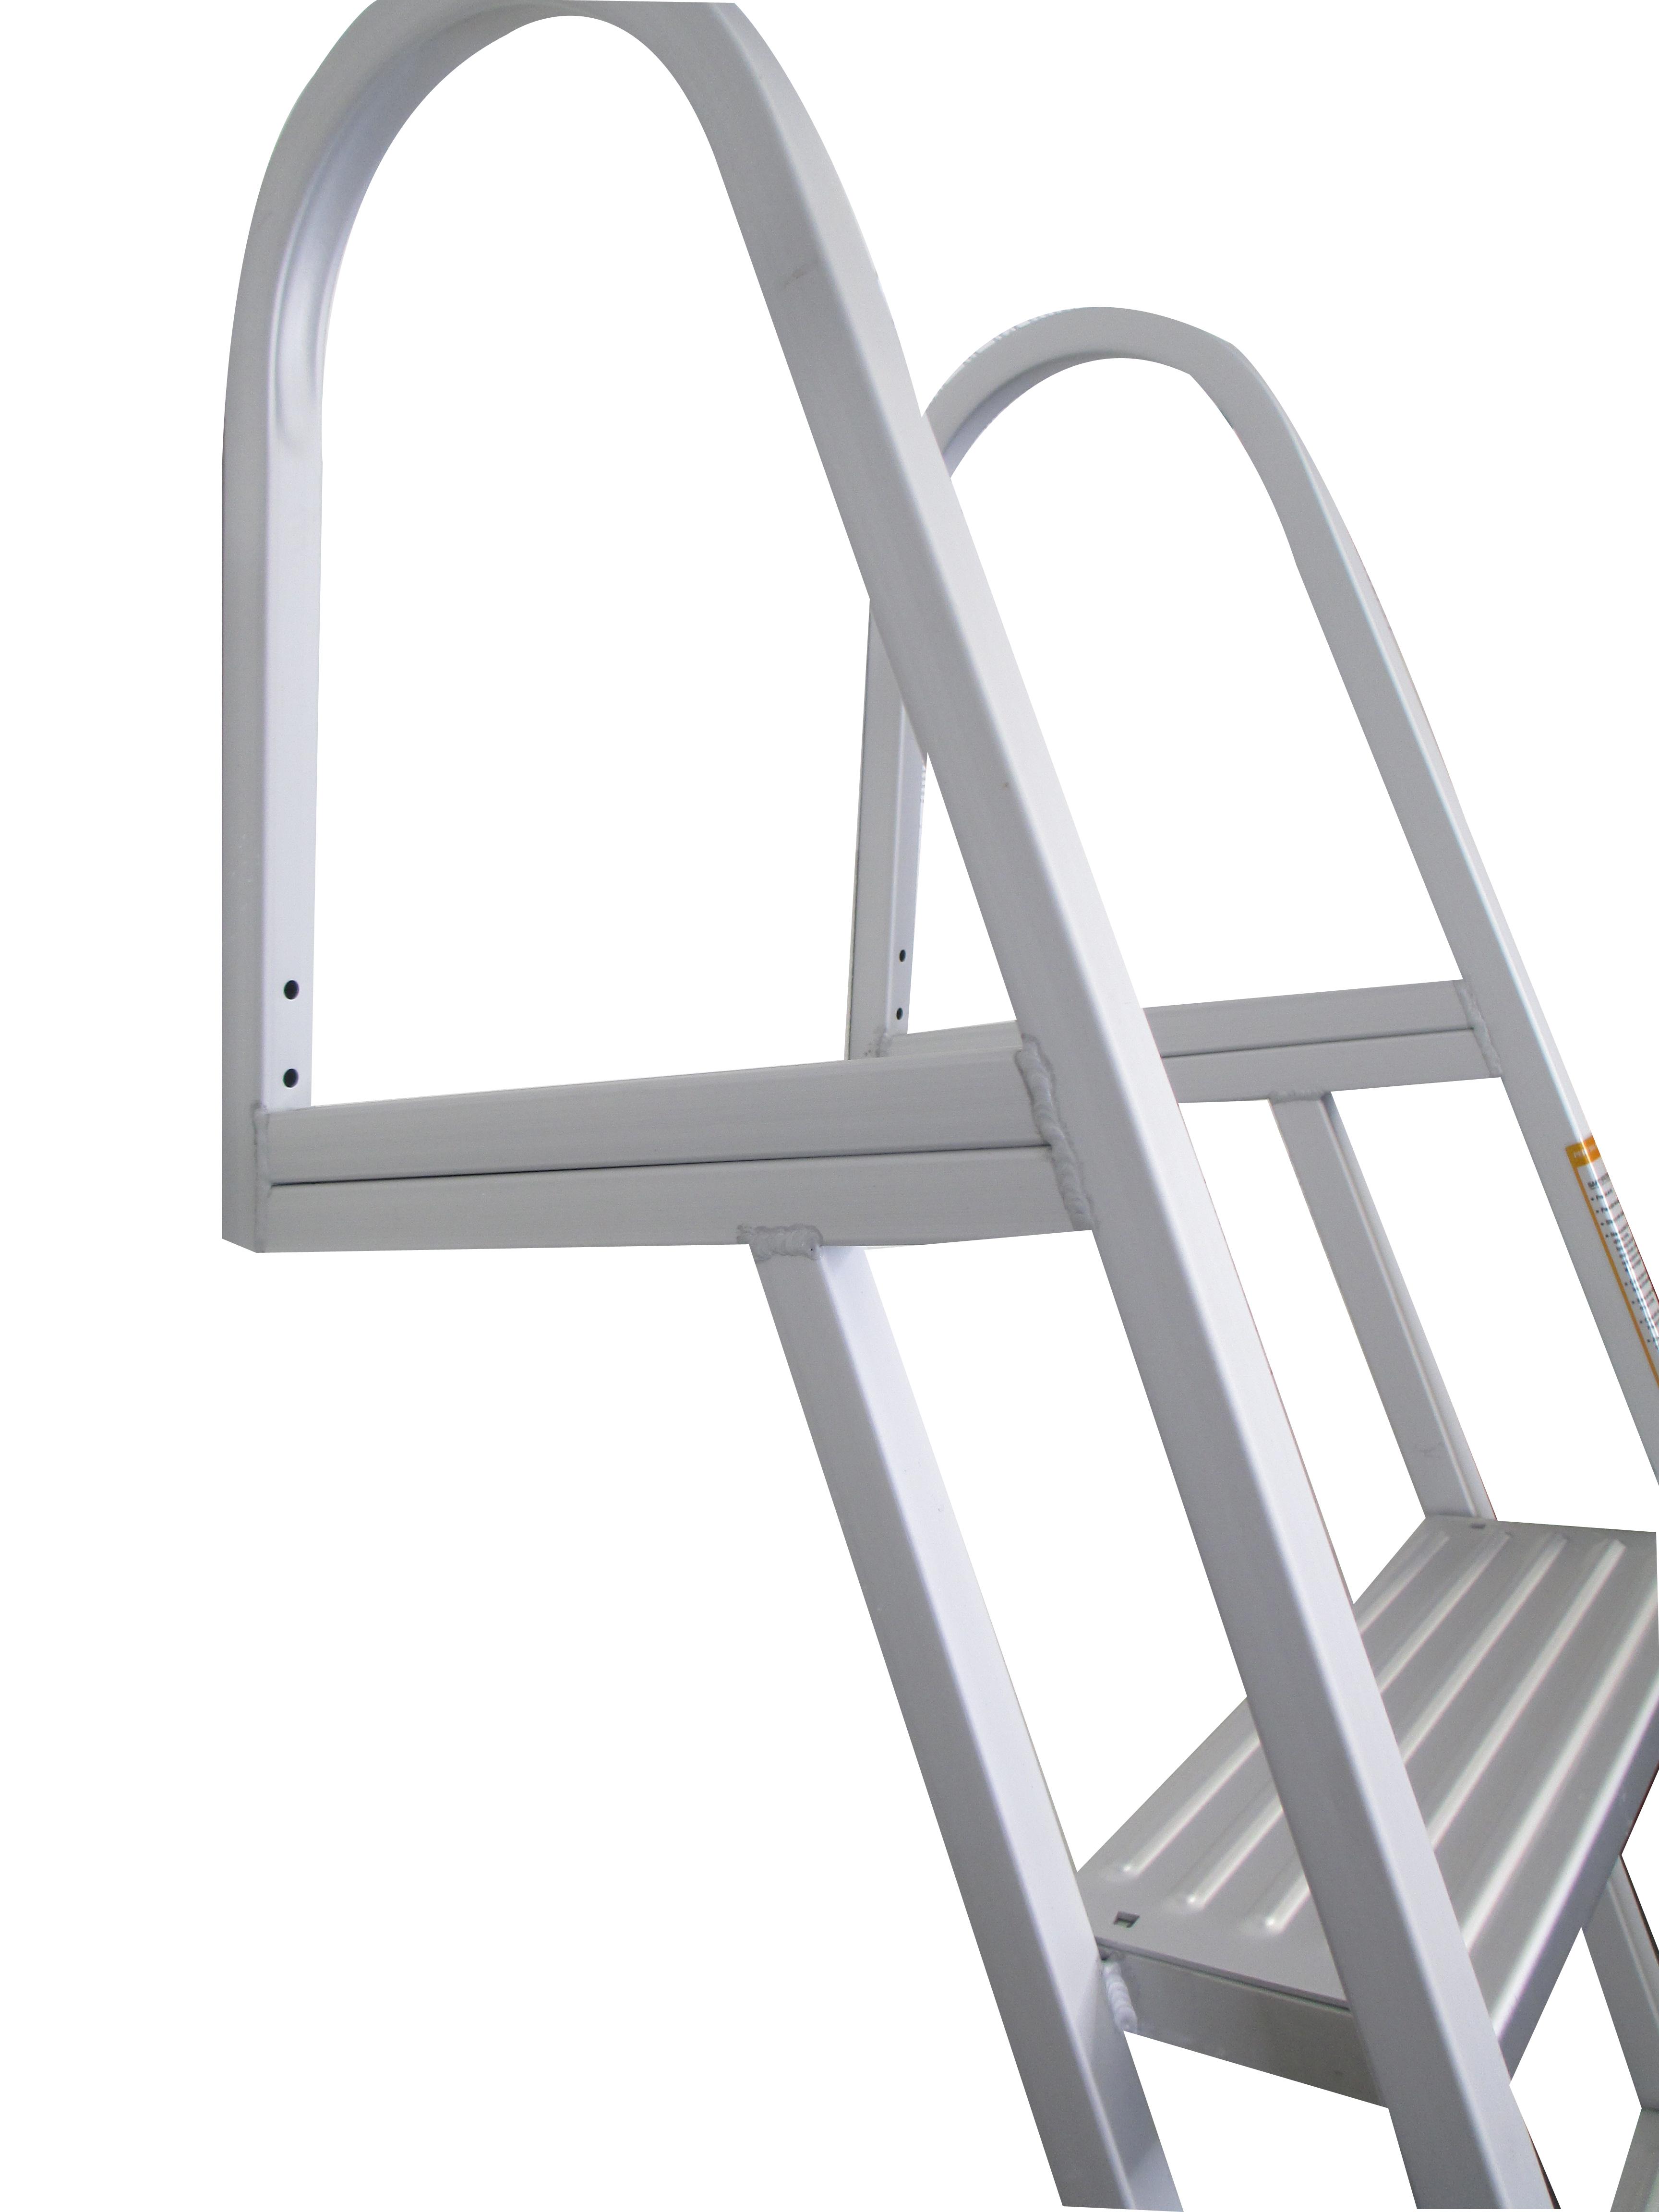 Pactrade Marine Pontoon Boat 5 Step Dock Ladder Aluminum